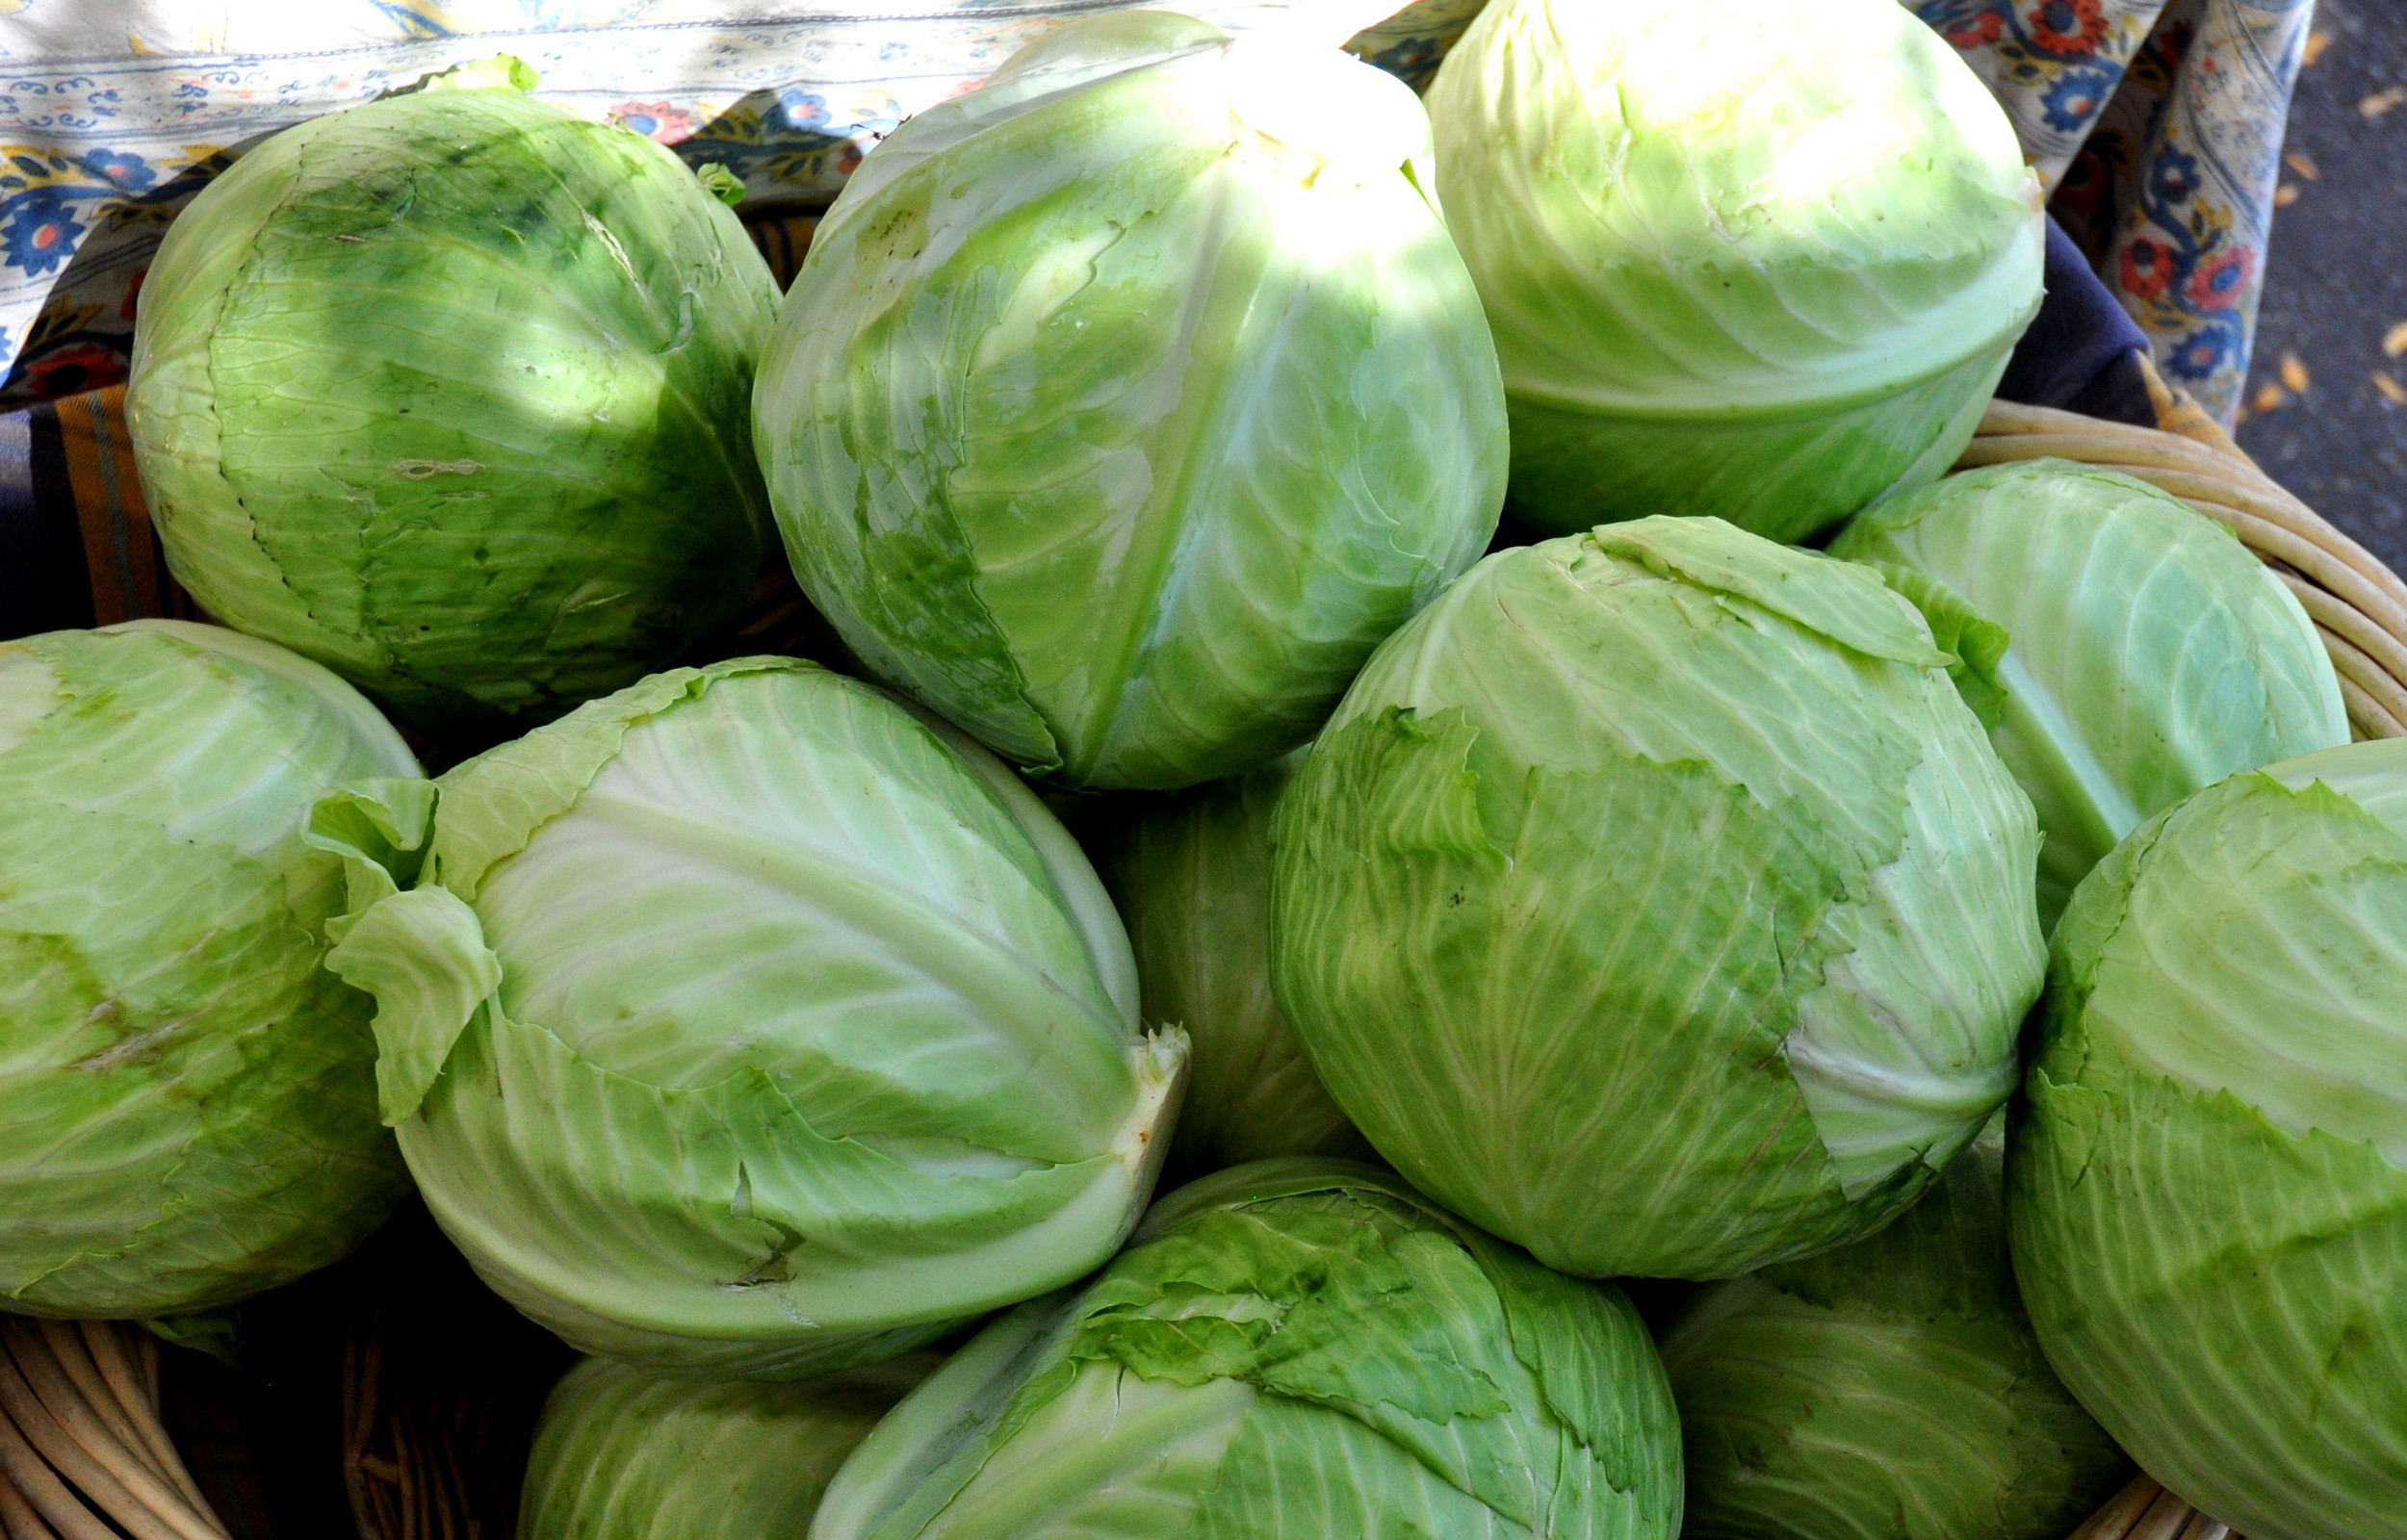 Green cabbage from Nash's Organic Produce at Ballard Farmers Market. Copyright Zachary D. Lyons.